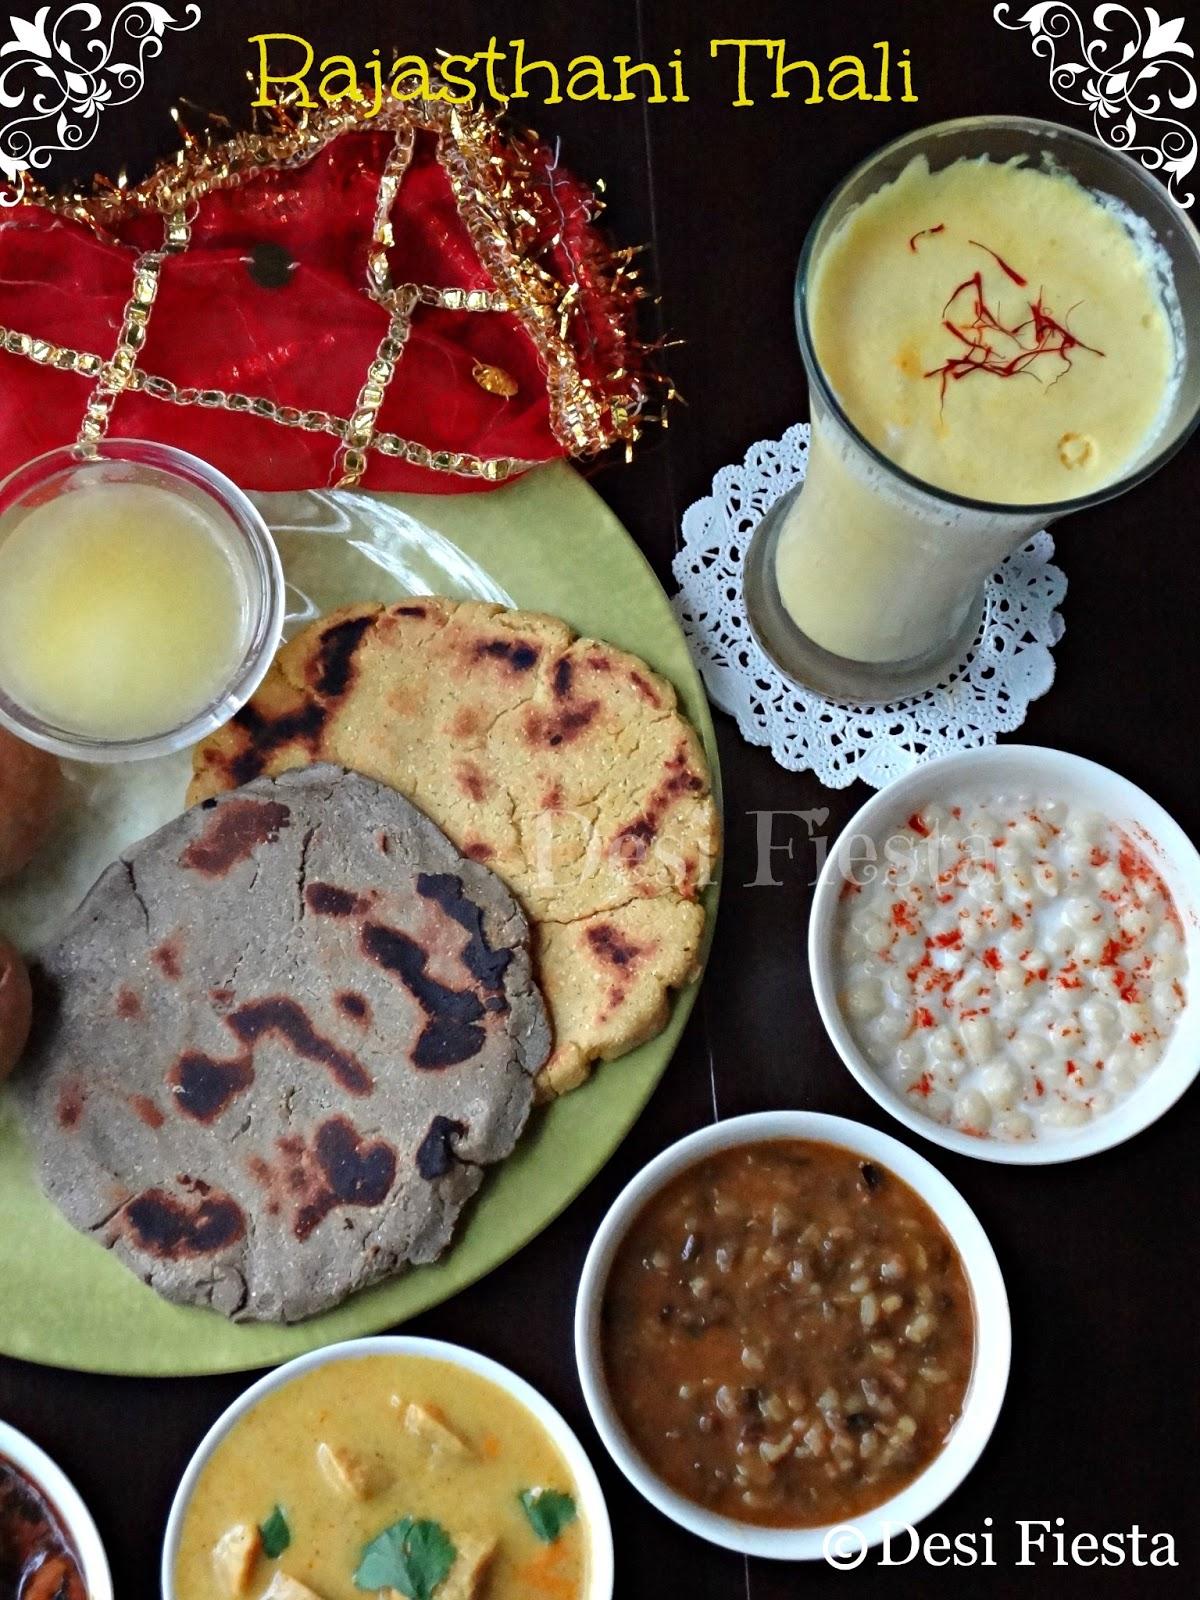 Rajasthani thali snc challange 10 desi fiesta forumfinder Choice Image